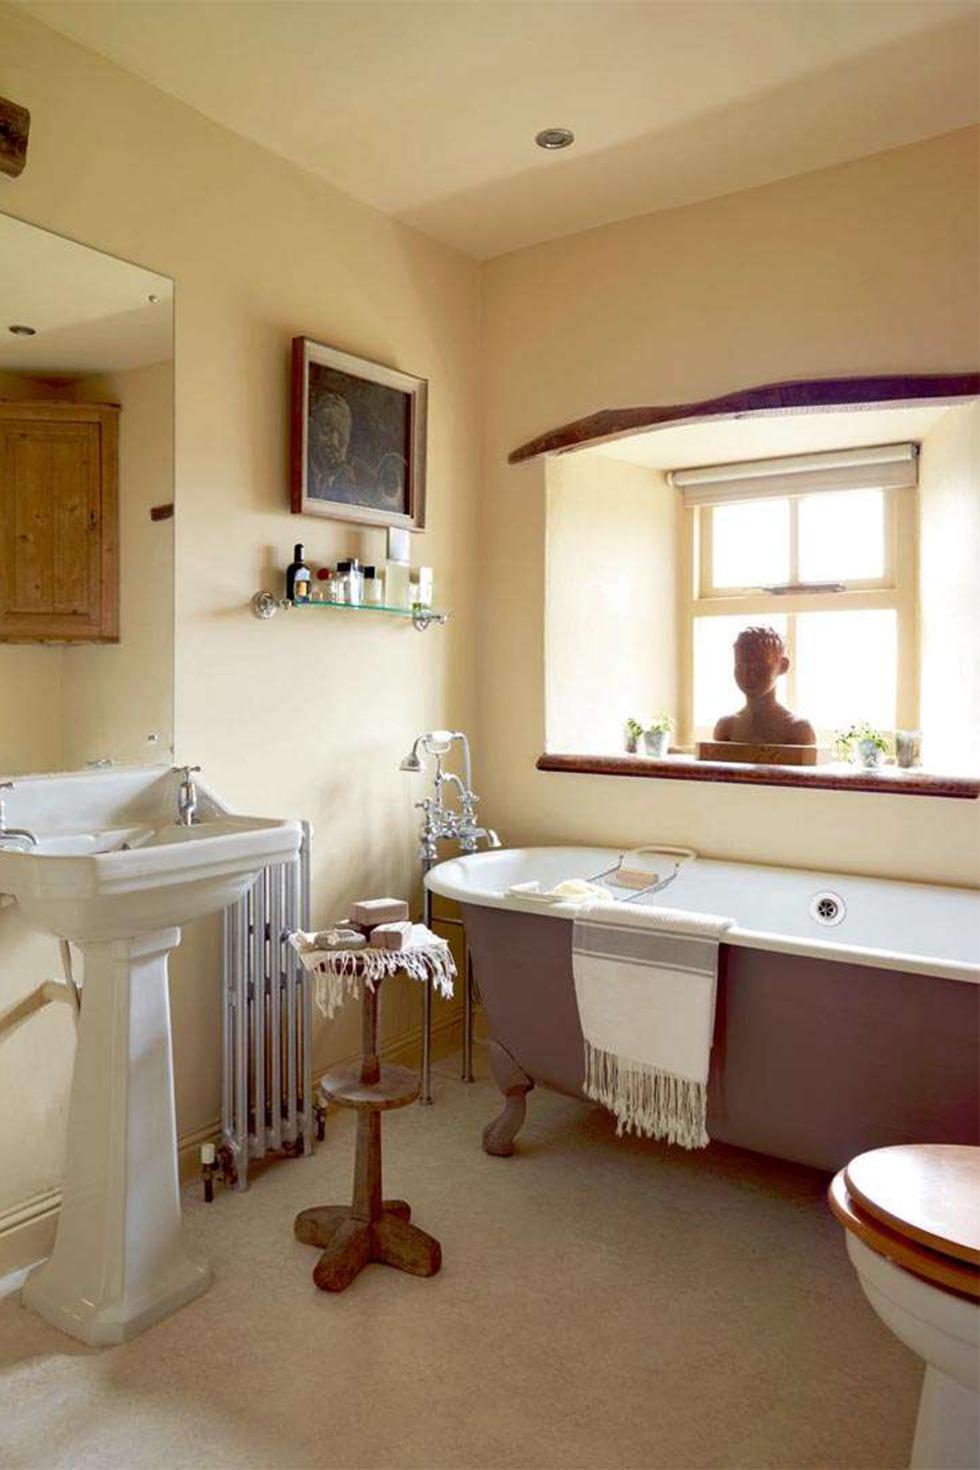 griffiths-bathroom